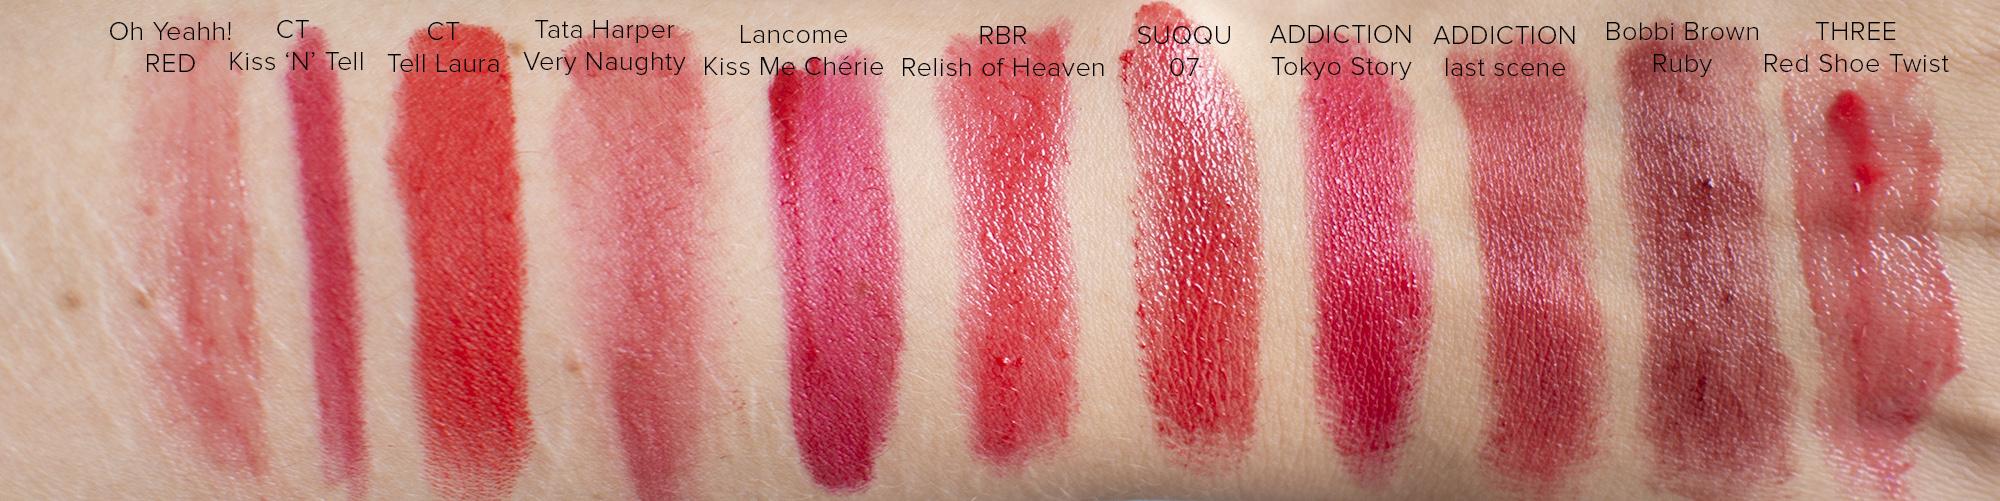 Favorite Red Lipstick Swatches | Laura Loukola Beauty Blog